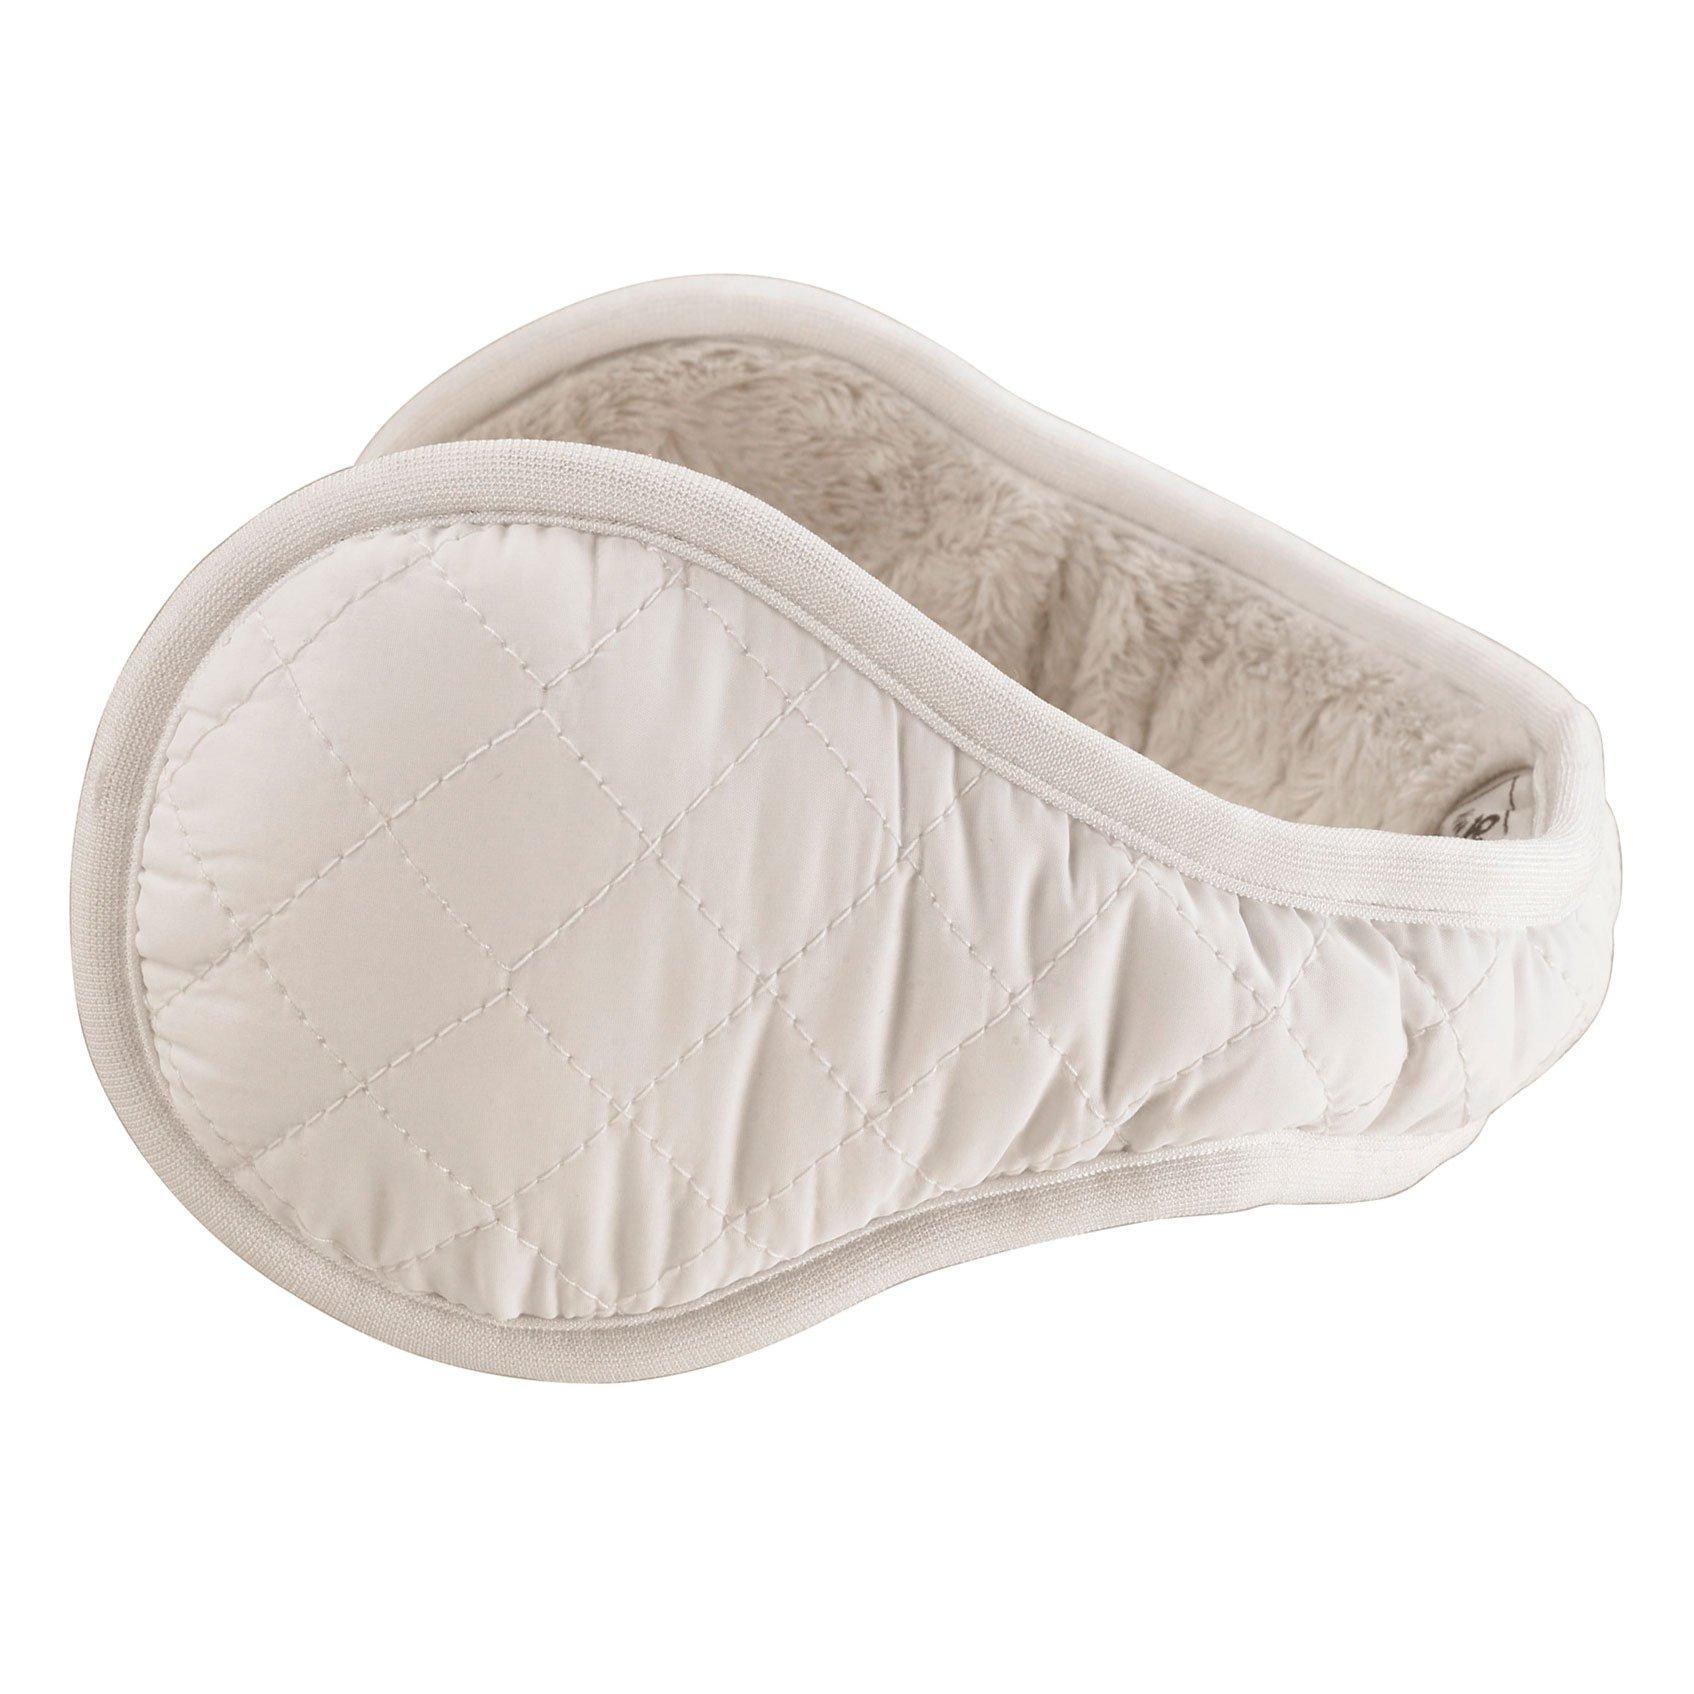 180s Women's Keystone Earmuffs, Snow, One Size